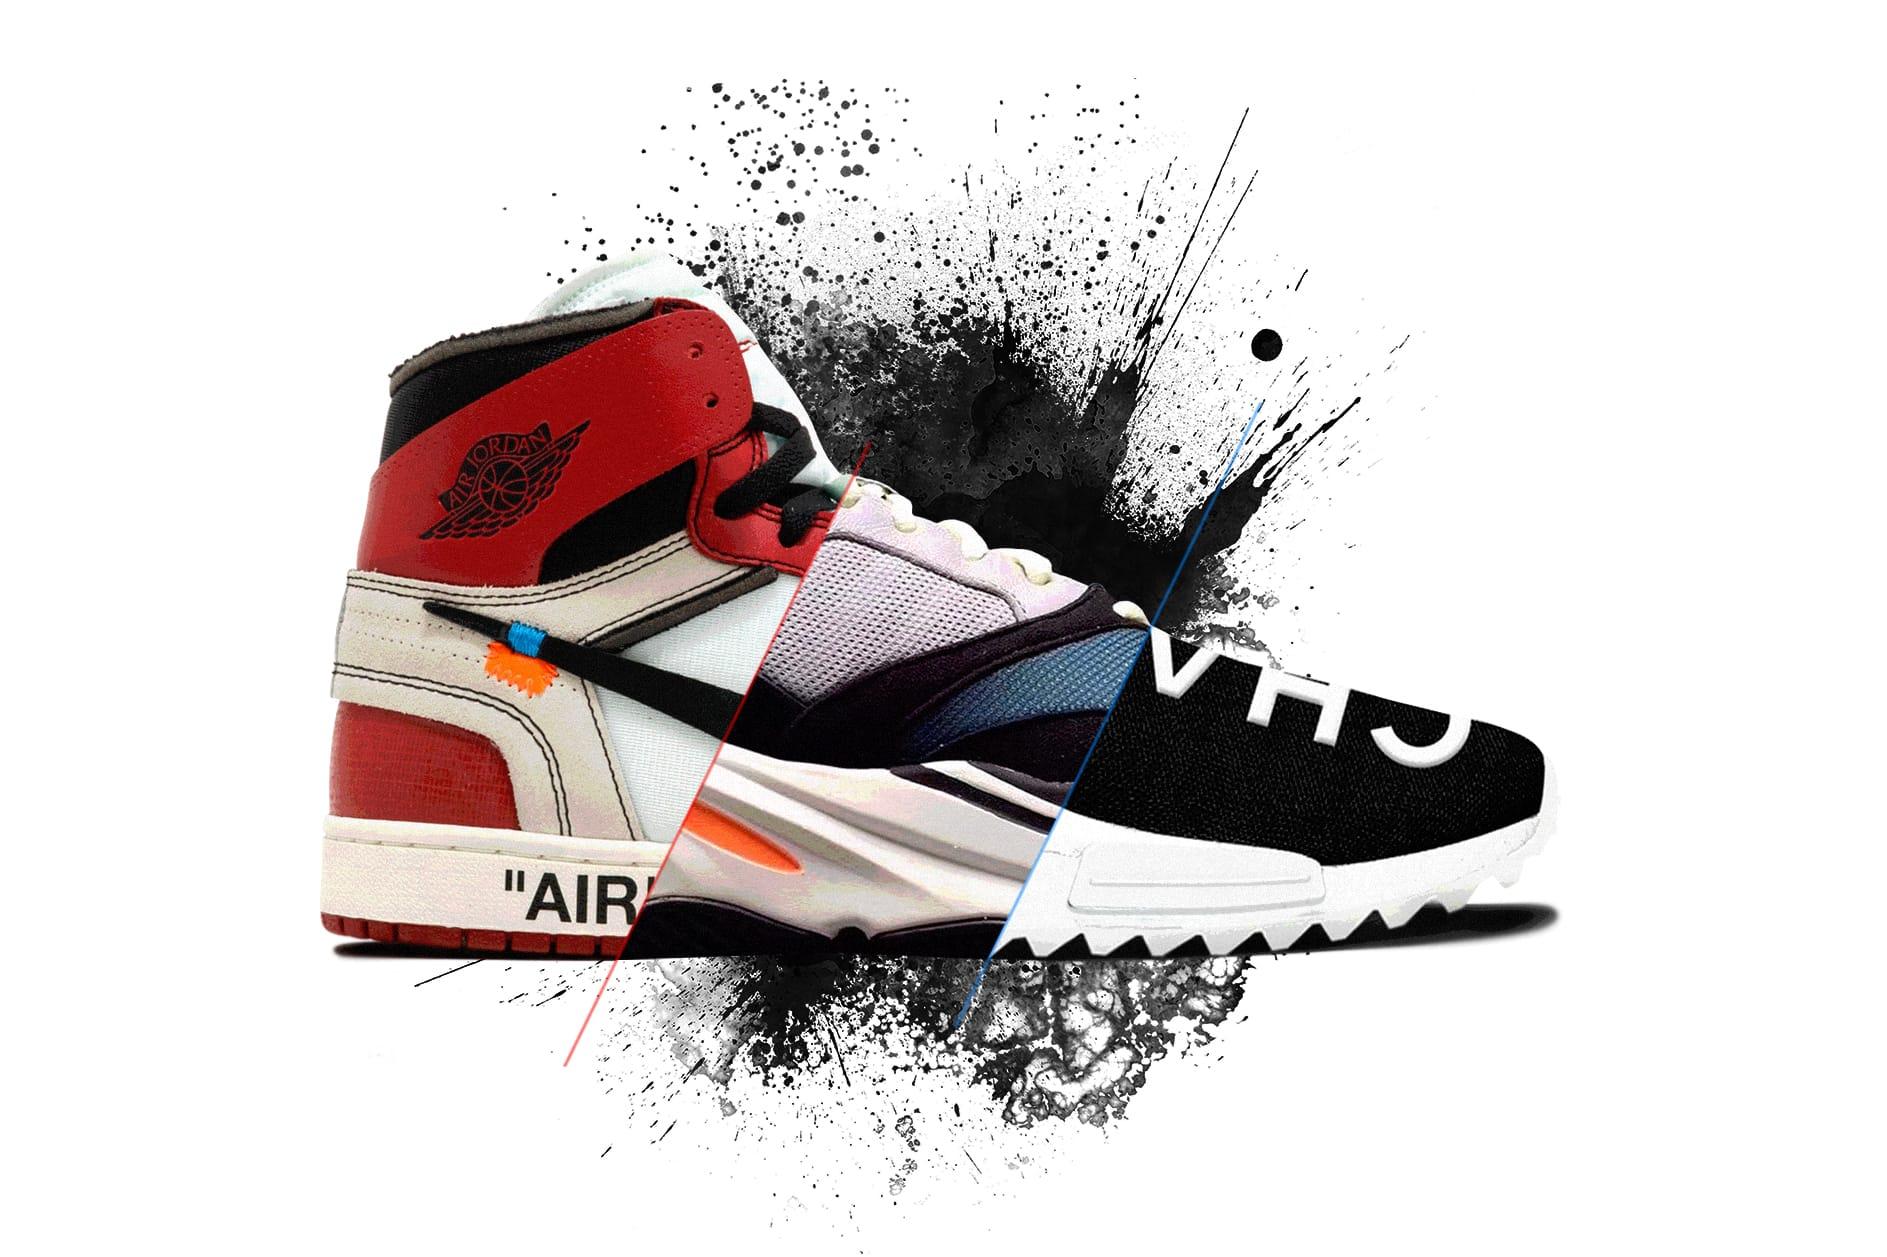 Top 10 Sneakers 2017